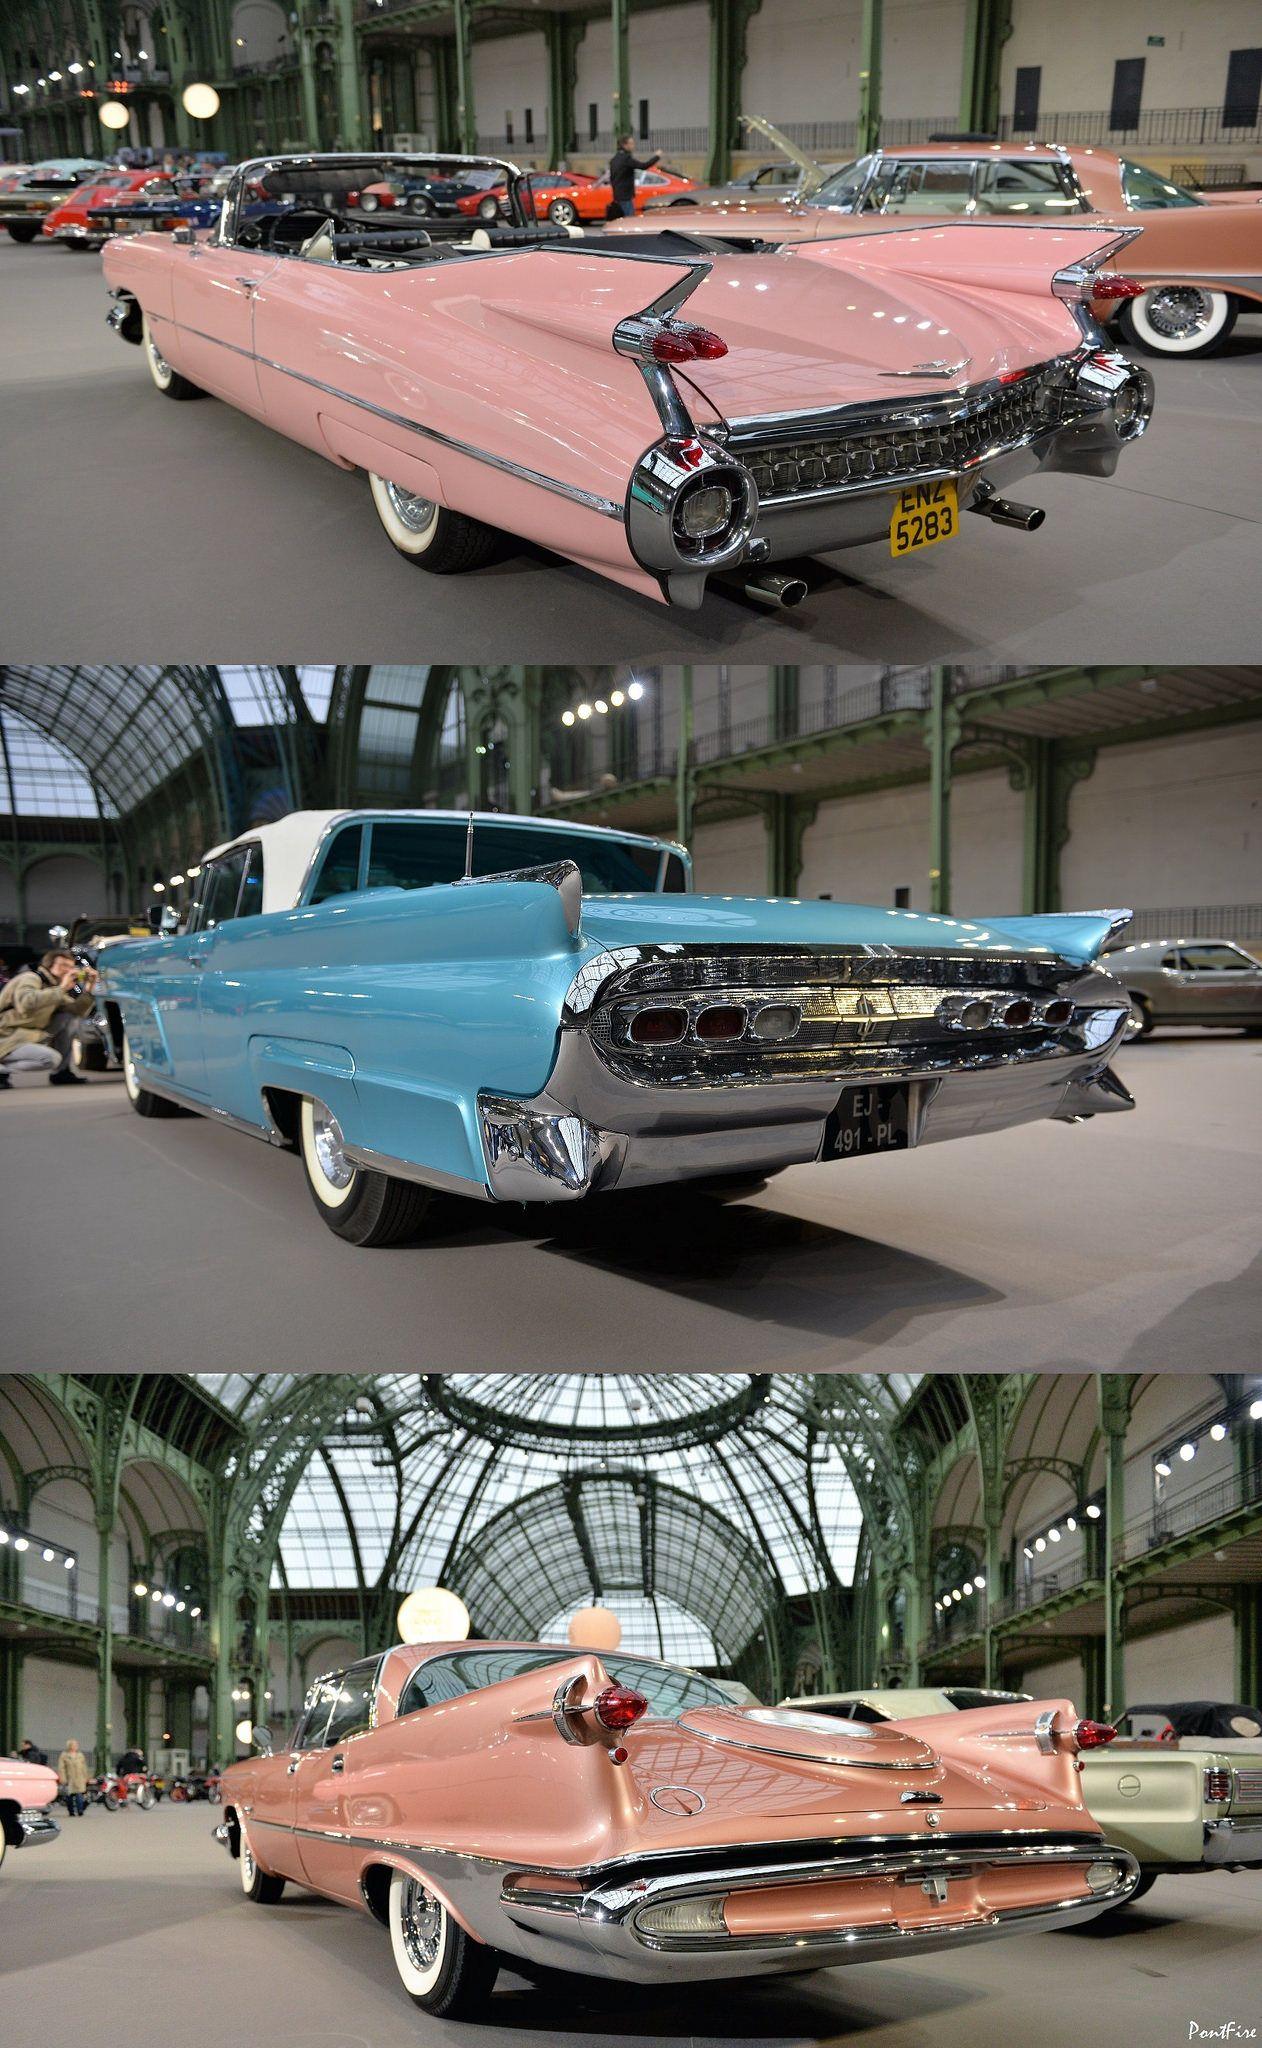 1959 American Luxury Car Classic Cars Trucks Vintage Cars Luxury Cars